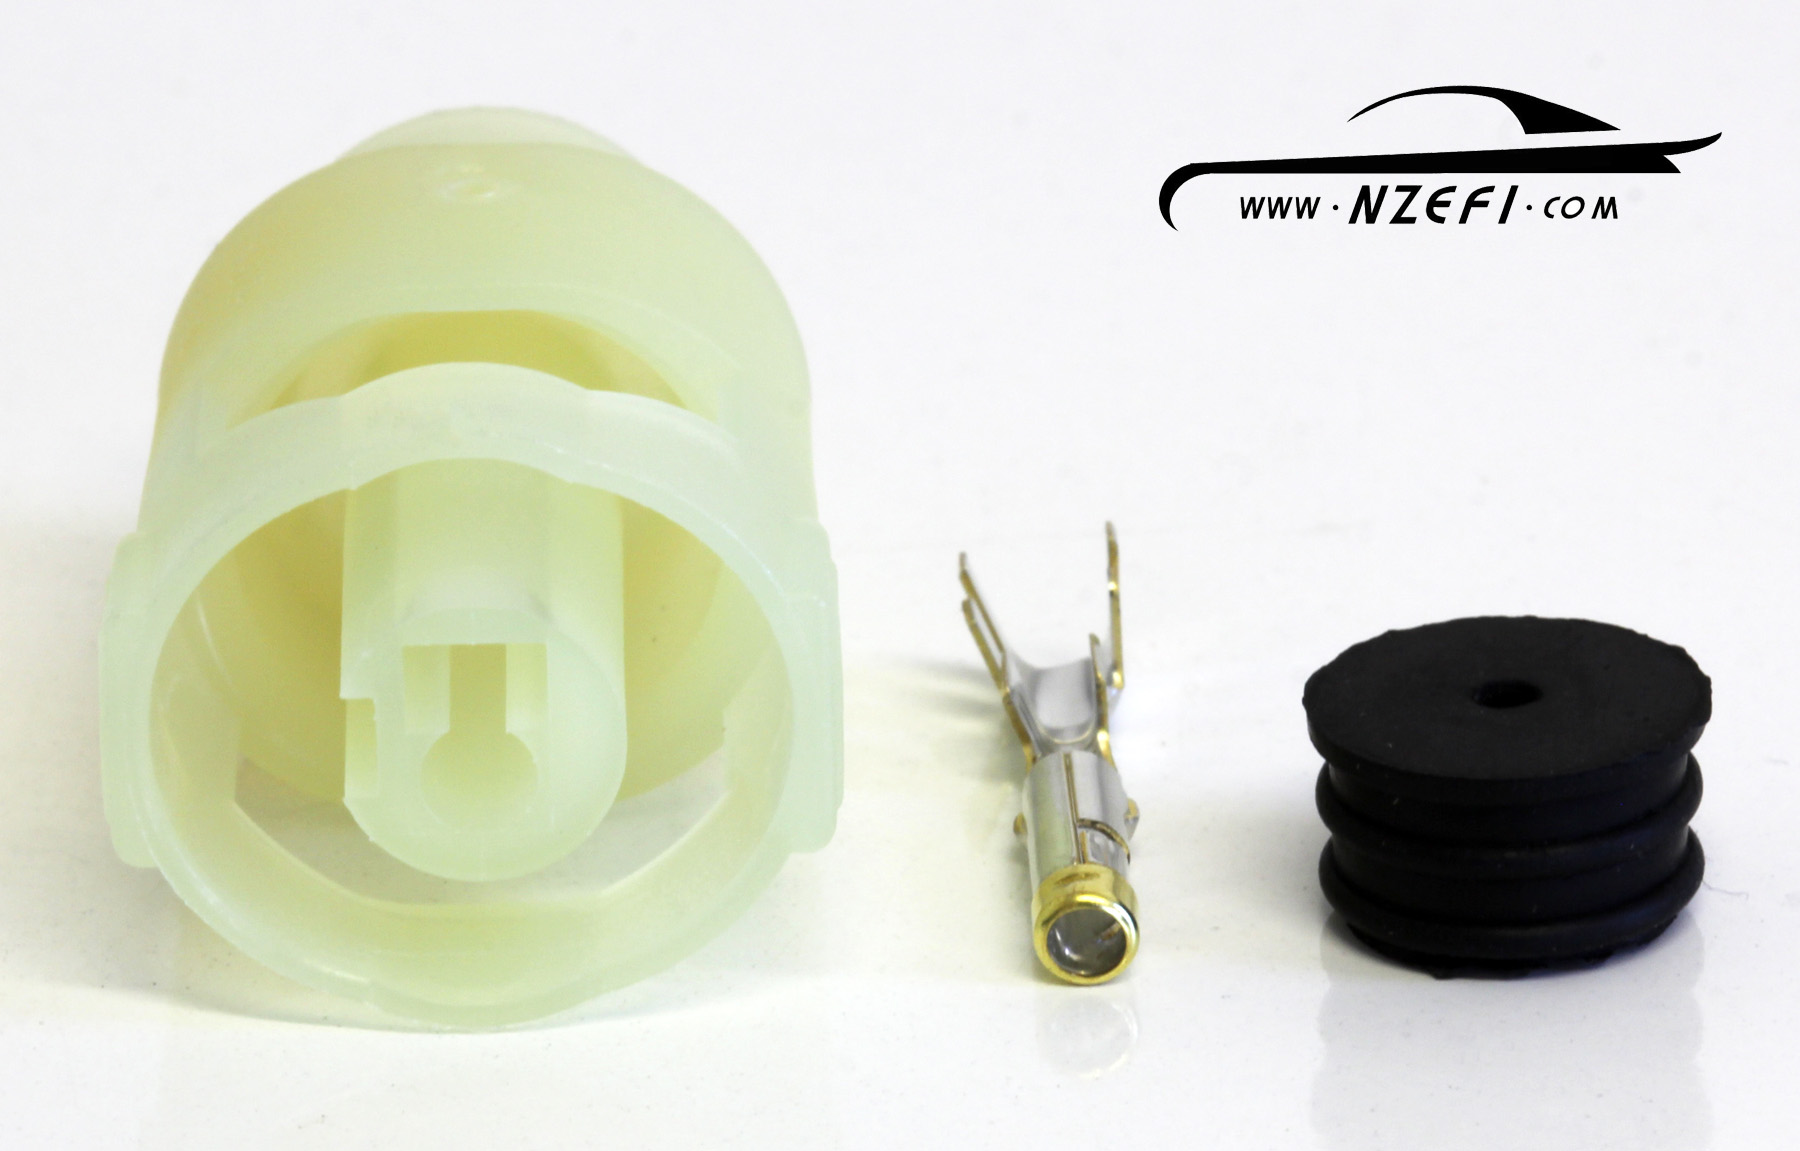 Nissan Knock Sensor Connector – RB20, RB25, CA18 on